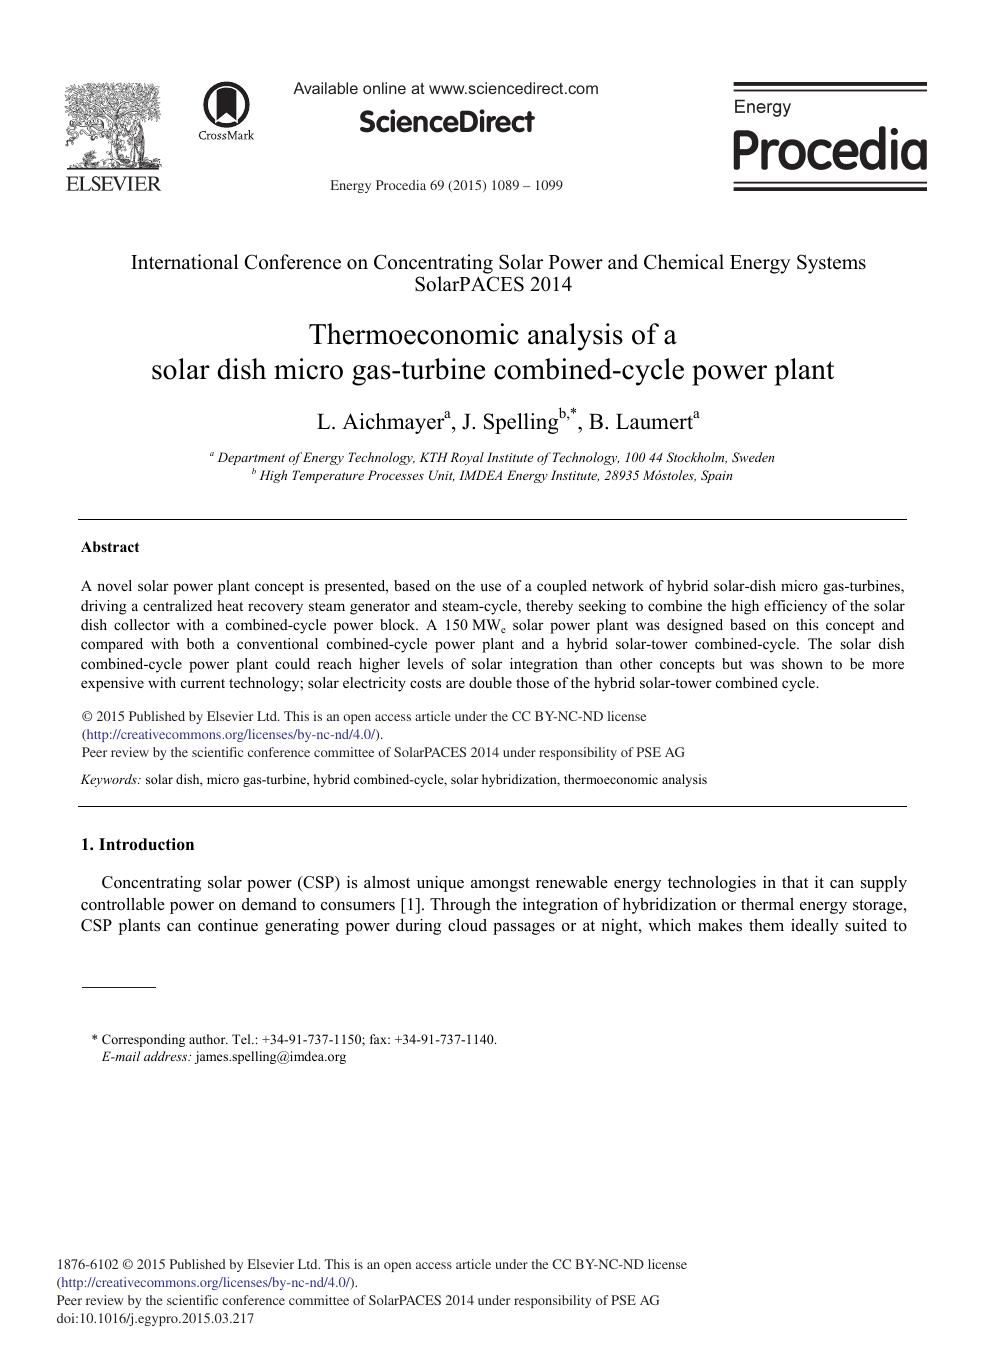 Thermoeconomic Analysis of a Solar Dish Micro Gas-turbine Combined